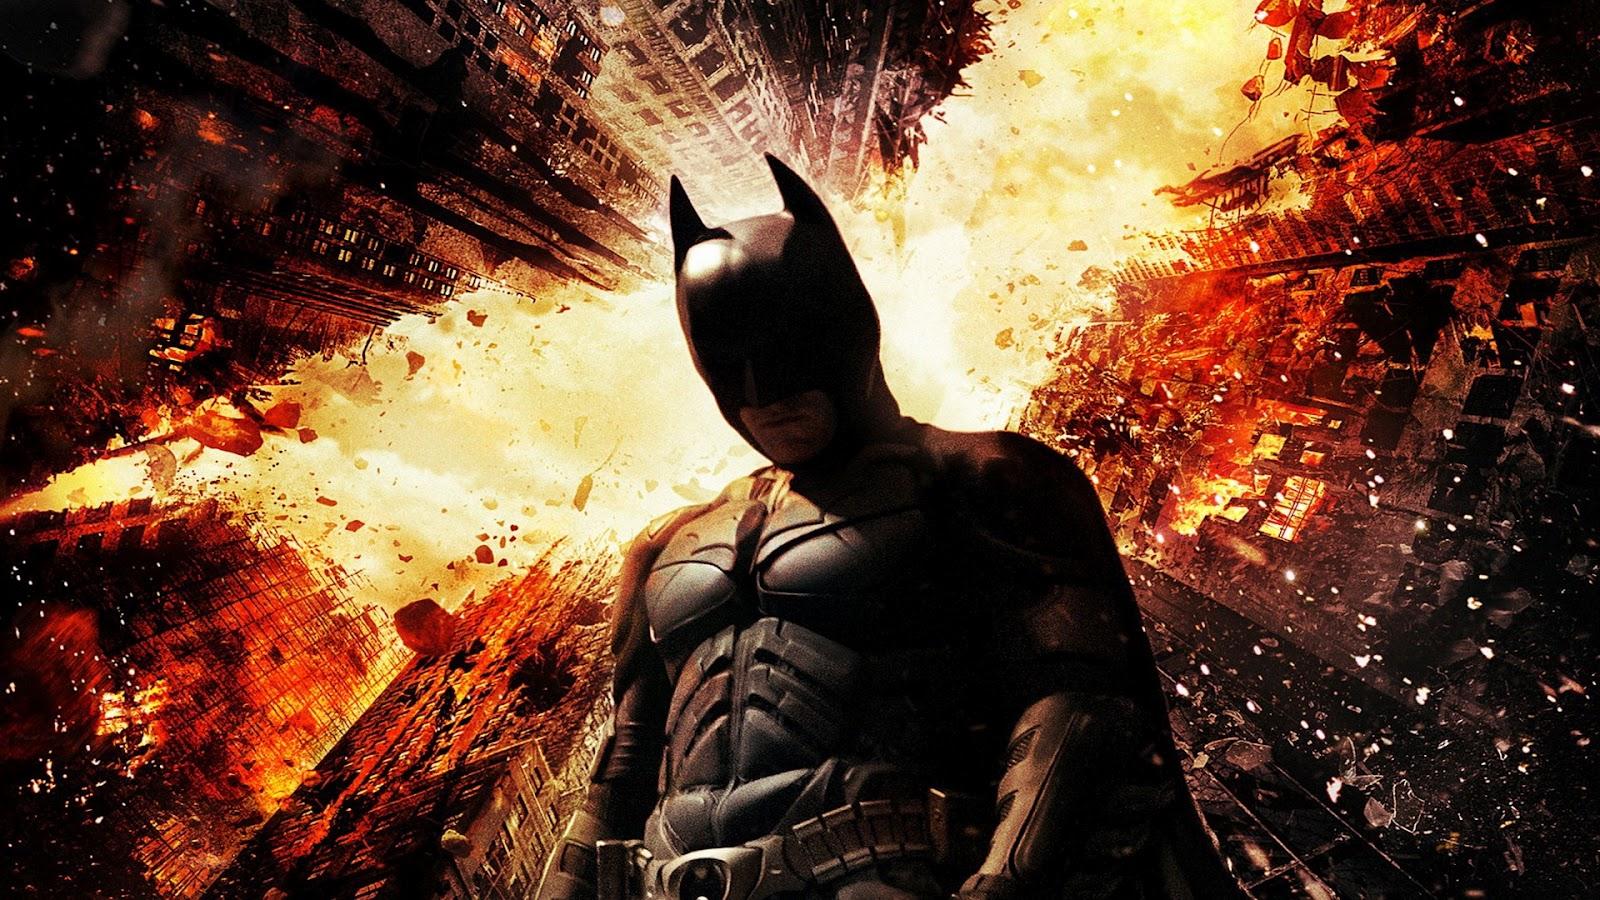 30+ Best Batman Wallpapers - Widescreen | The-Area51.com ...